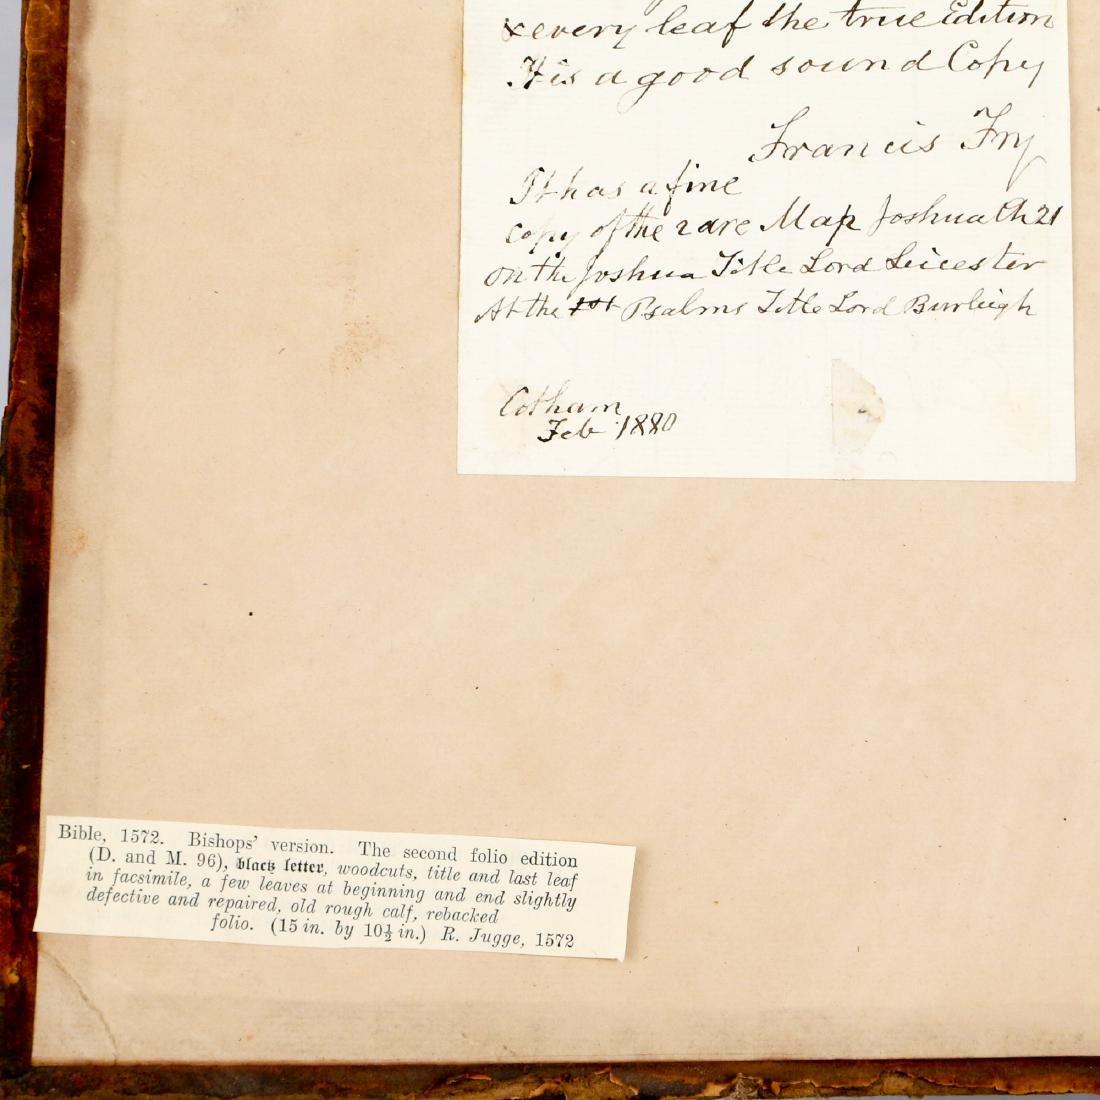 [FRANCIS FRY COPY] BISHOPS' BIBLE [1572] - 7